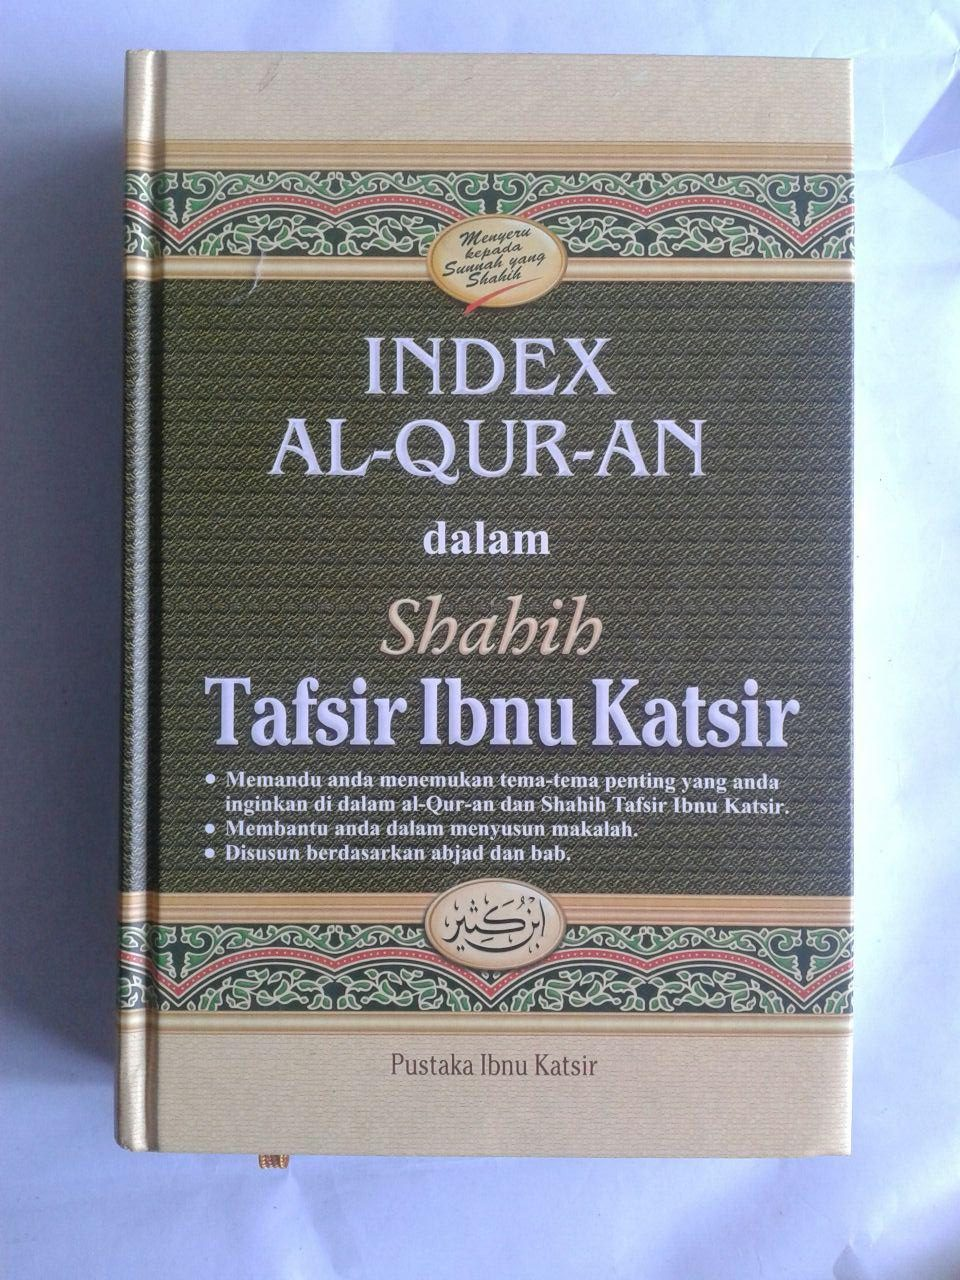 Buku Index Al-Qur'an Dalam Shahih Tafsir Ibnu Katsir cover 2